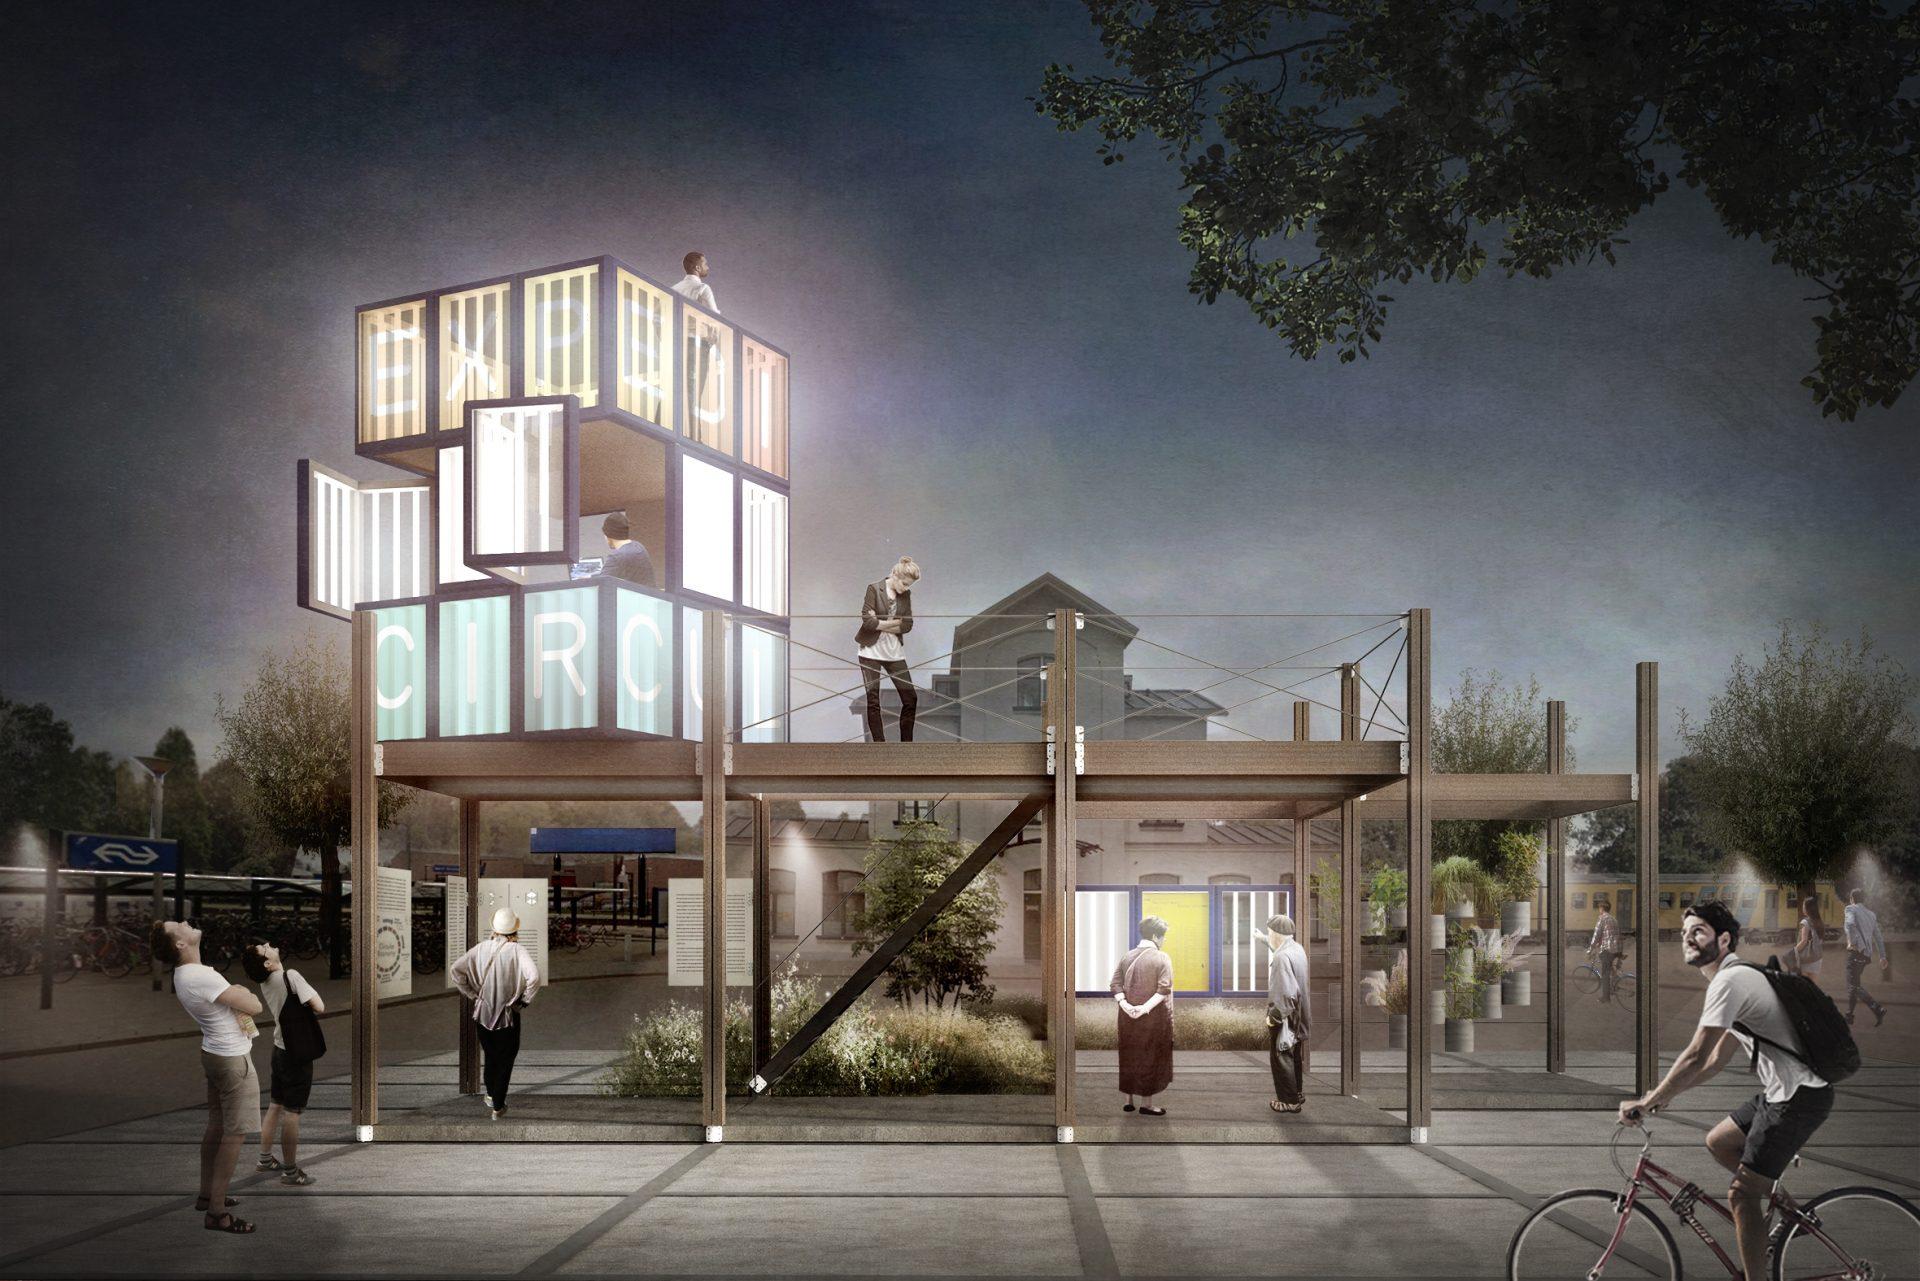 Reizend, circulair en modulair paviljoen